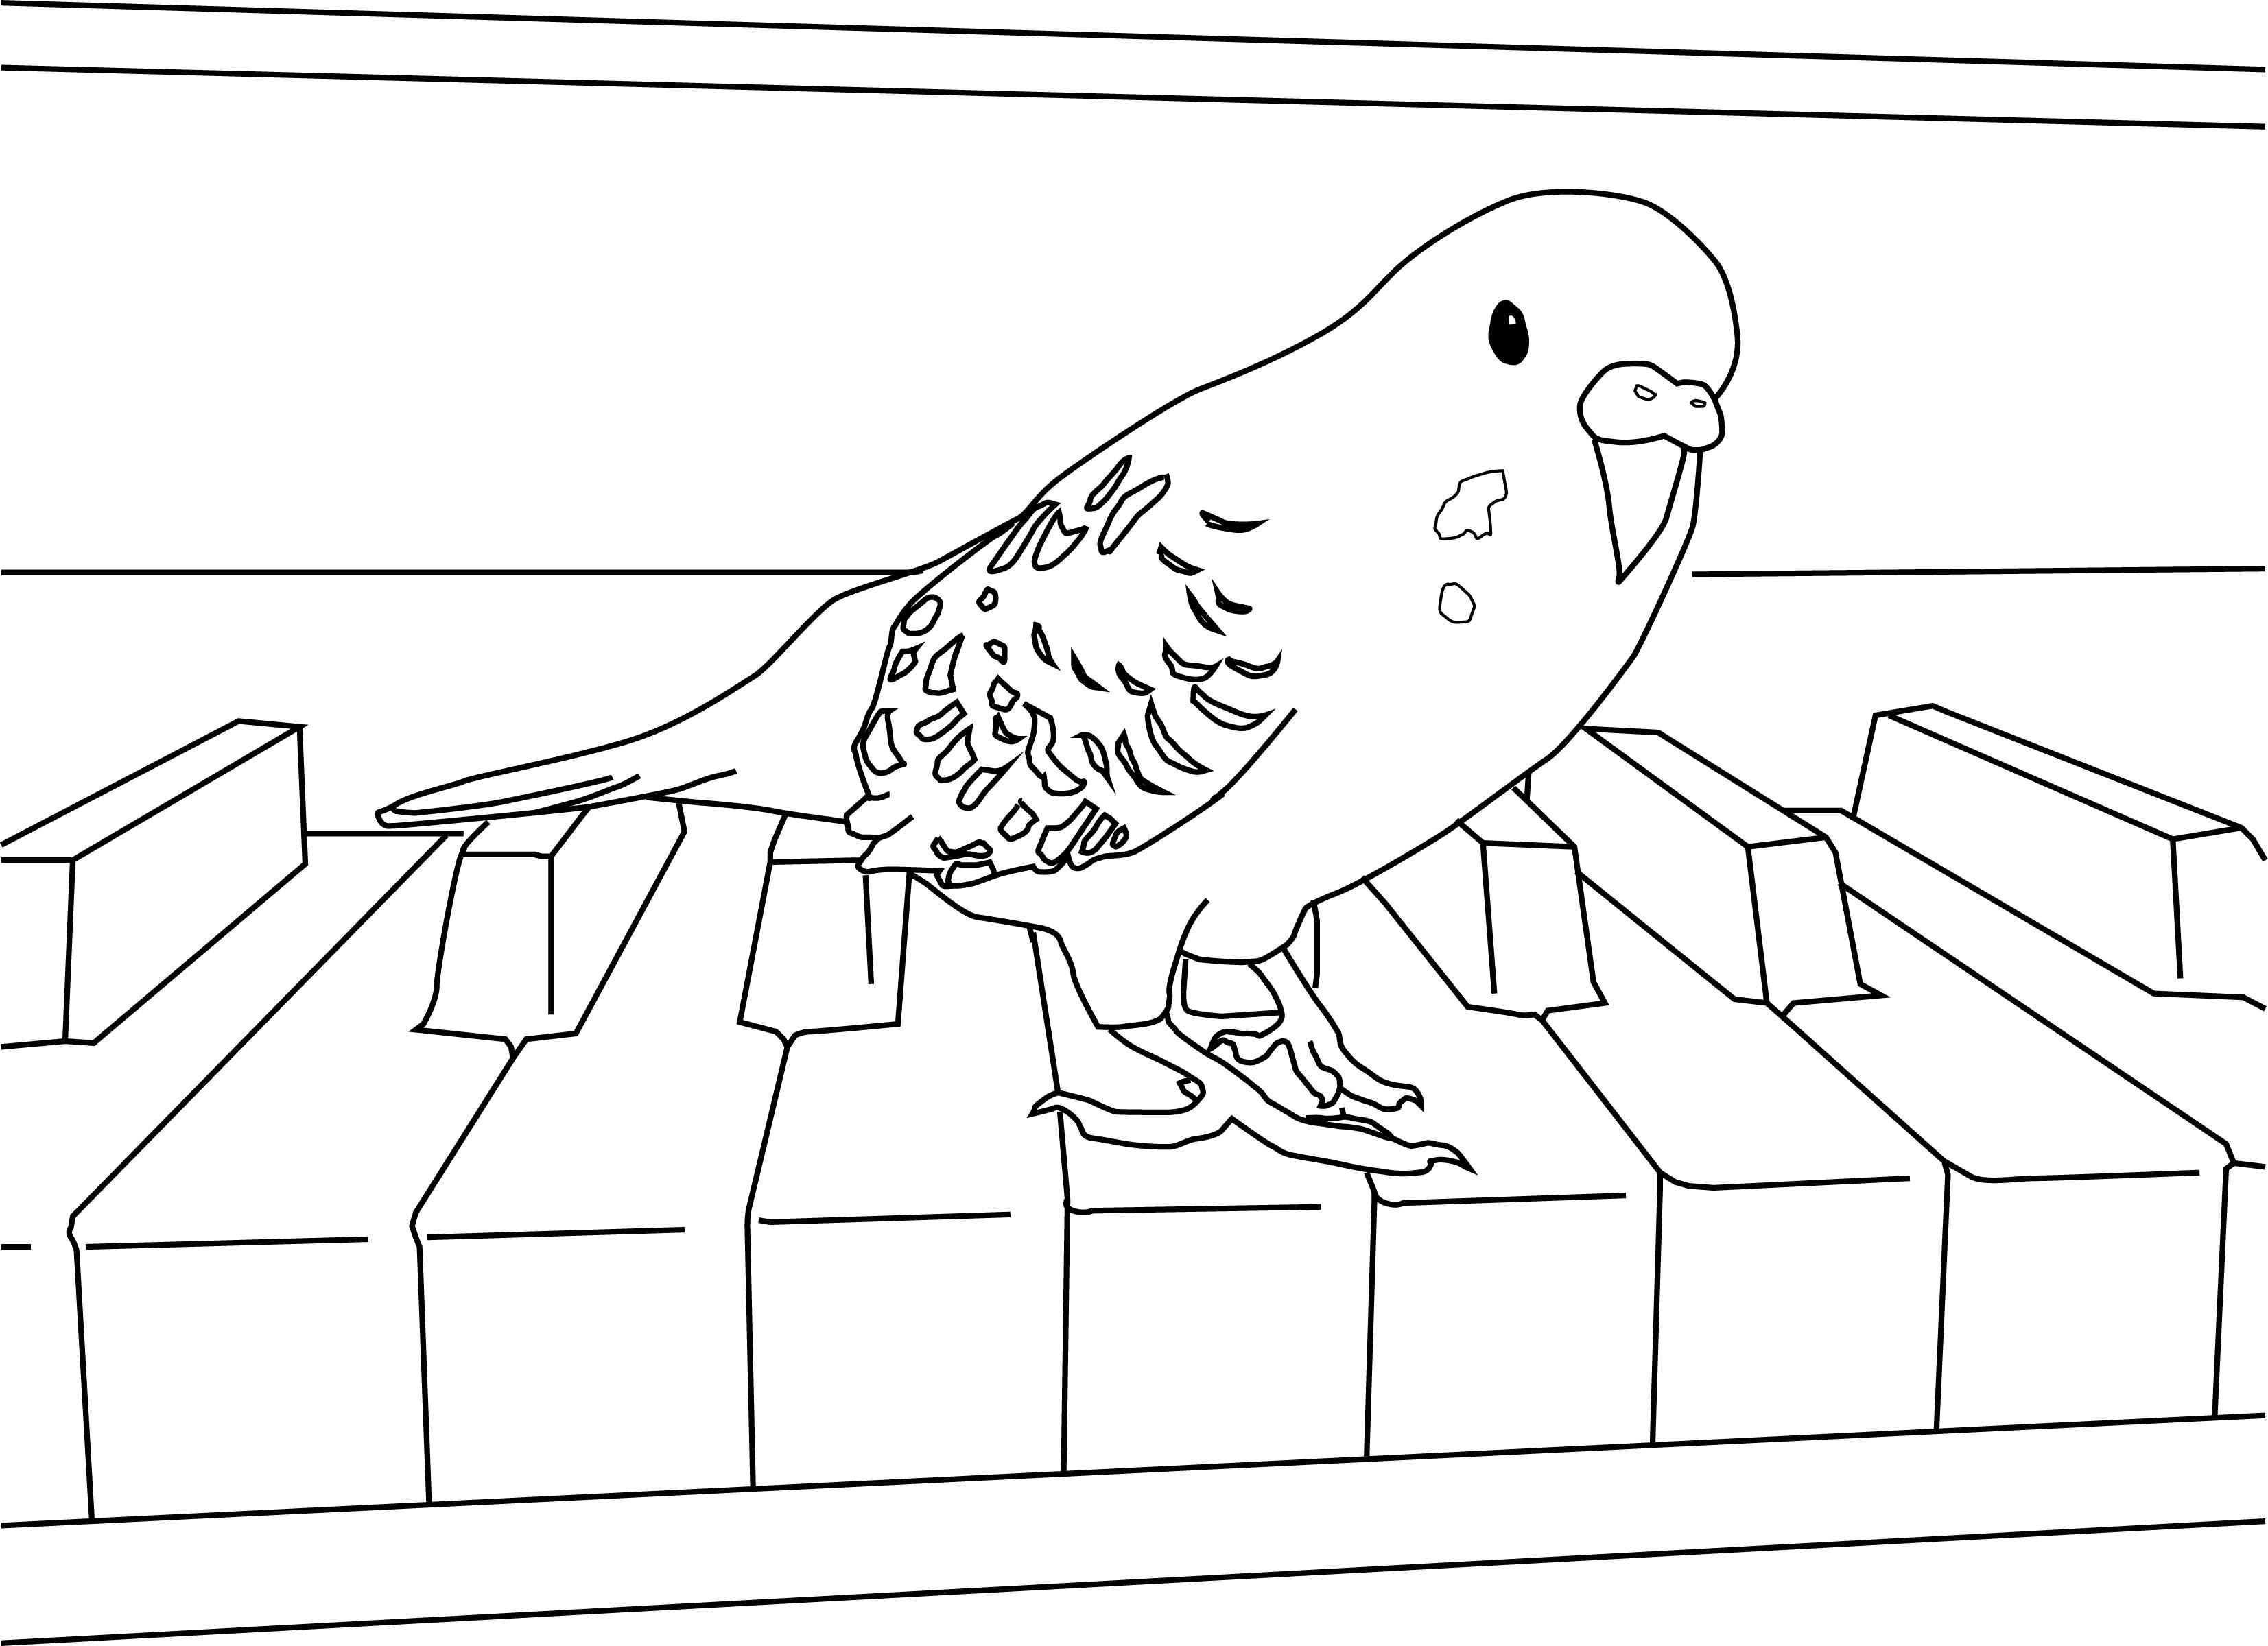 cockatiel coloring pages parakeet coloring pages coloring pages cool coloring pages cockatiel coloring